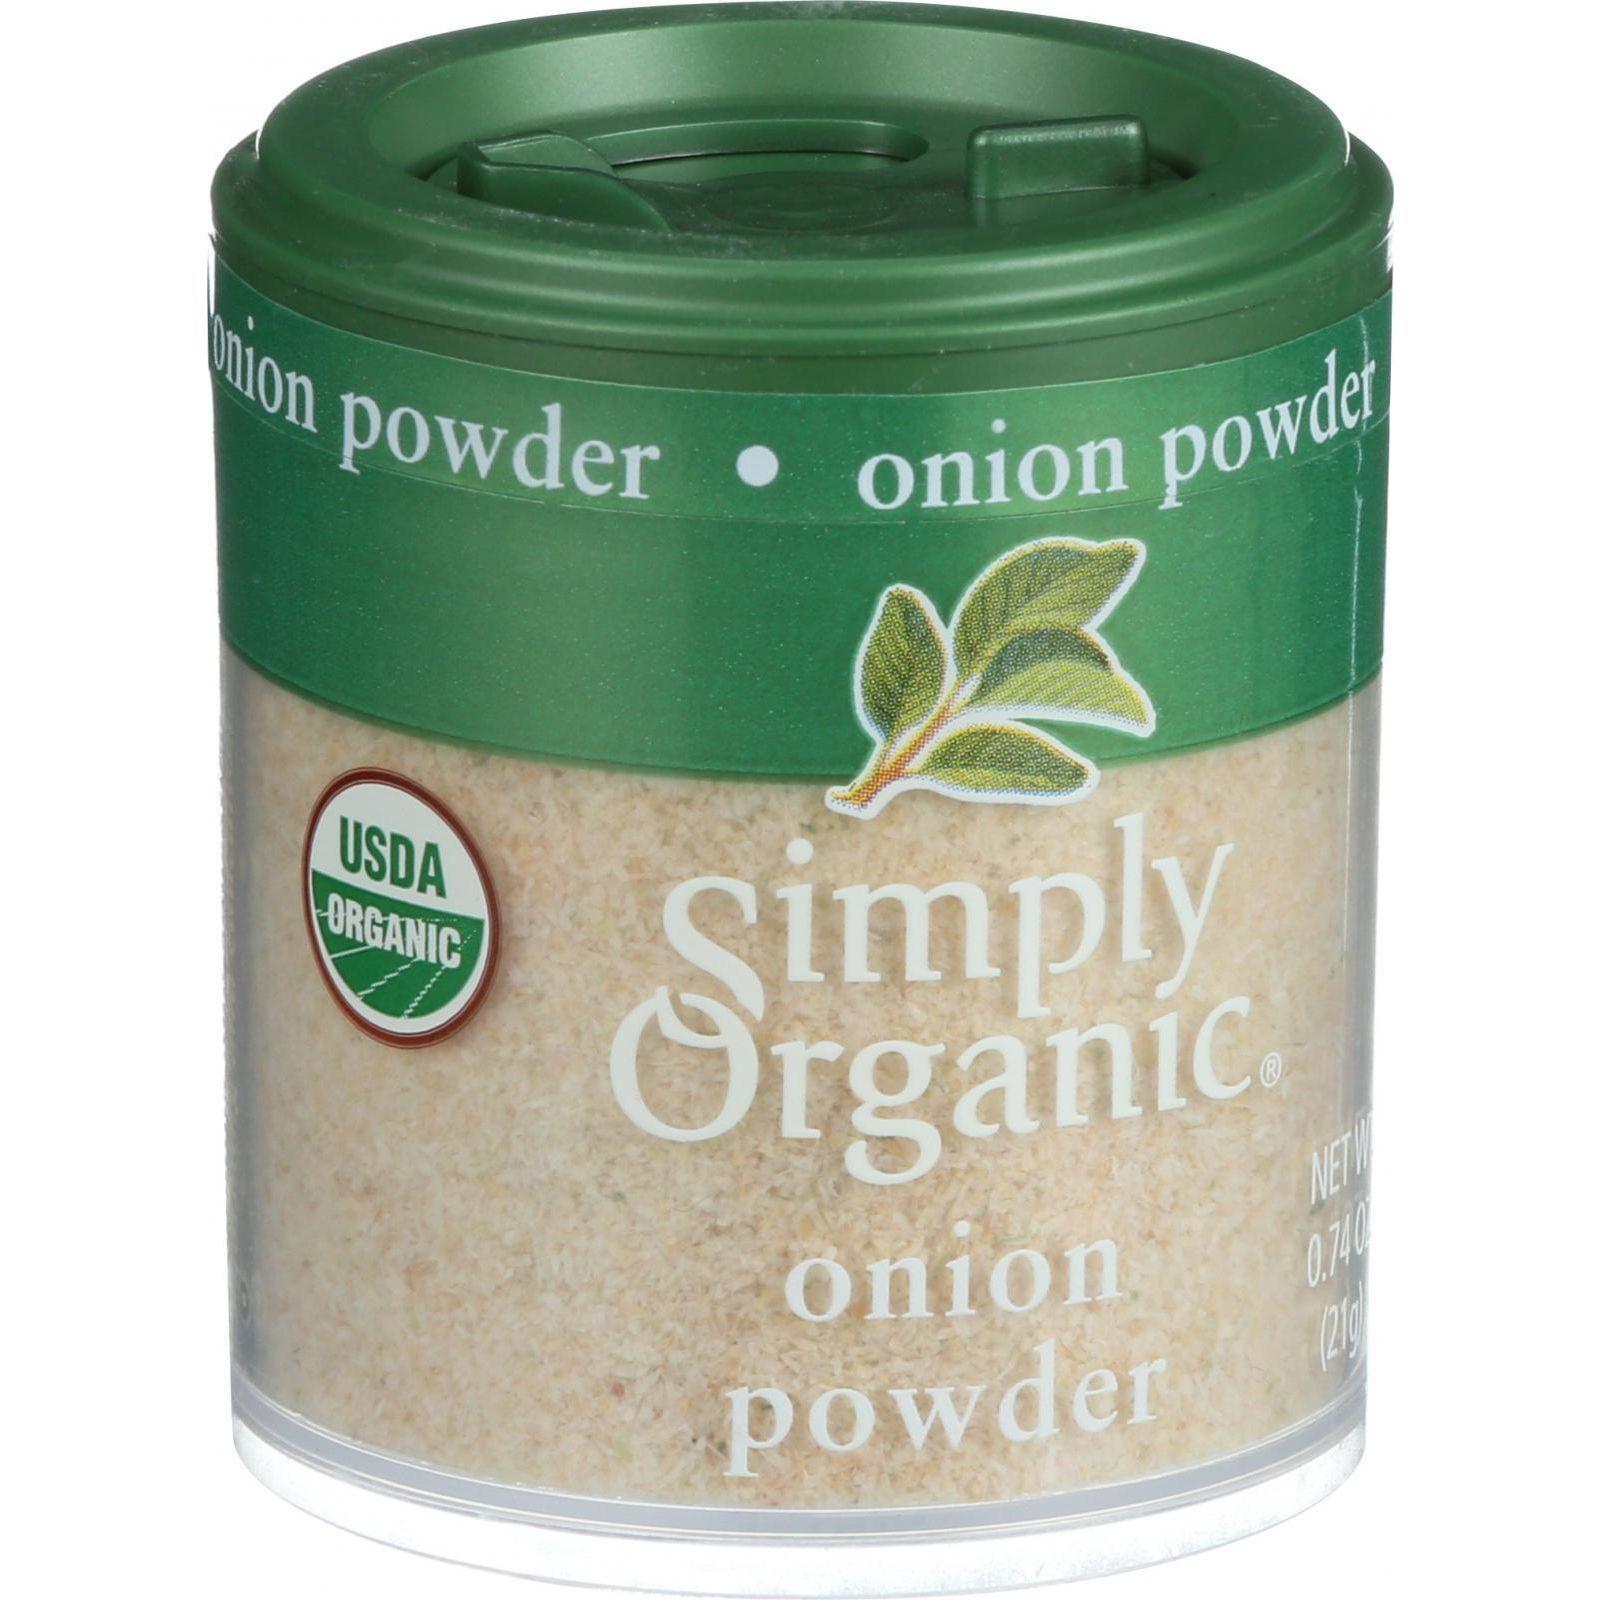 Simply Organic Onion - Organic - Powder - White - .74 oz - Case of 6